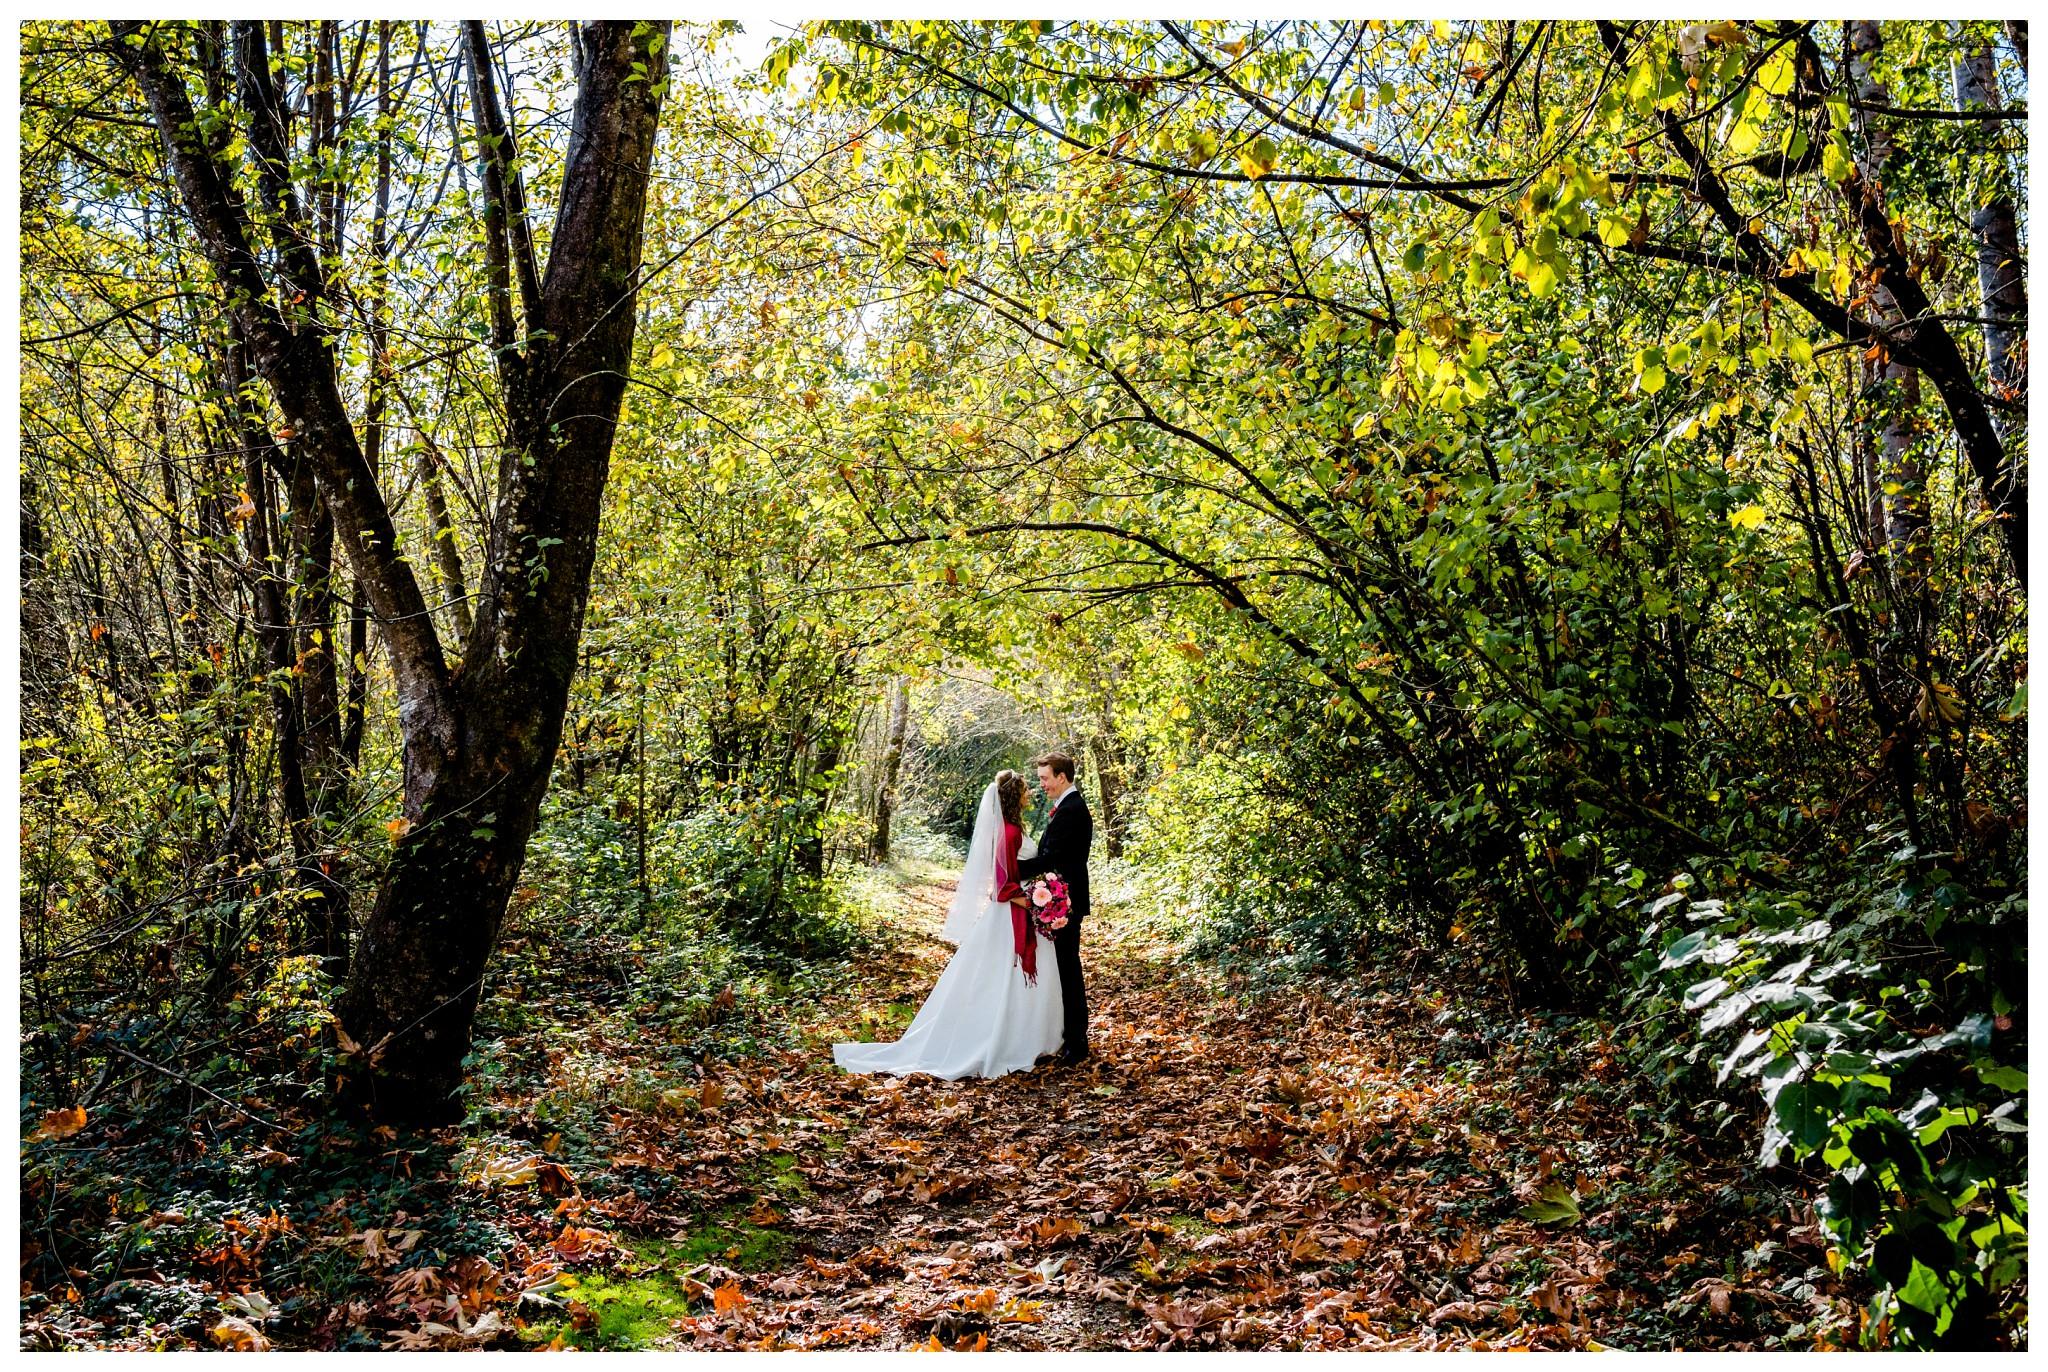 Aldergrove Park Christian Church Wedding Photography Pink Flowers Blue Bridesmaid Dress Fall_0086.jpg